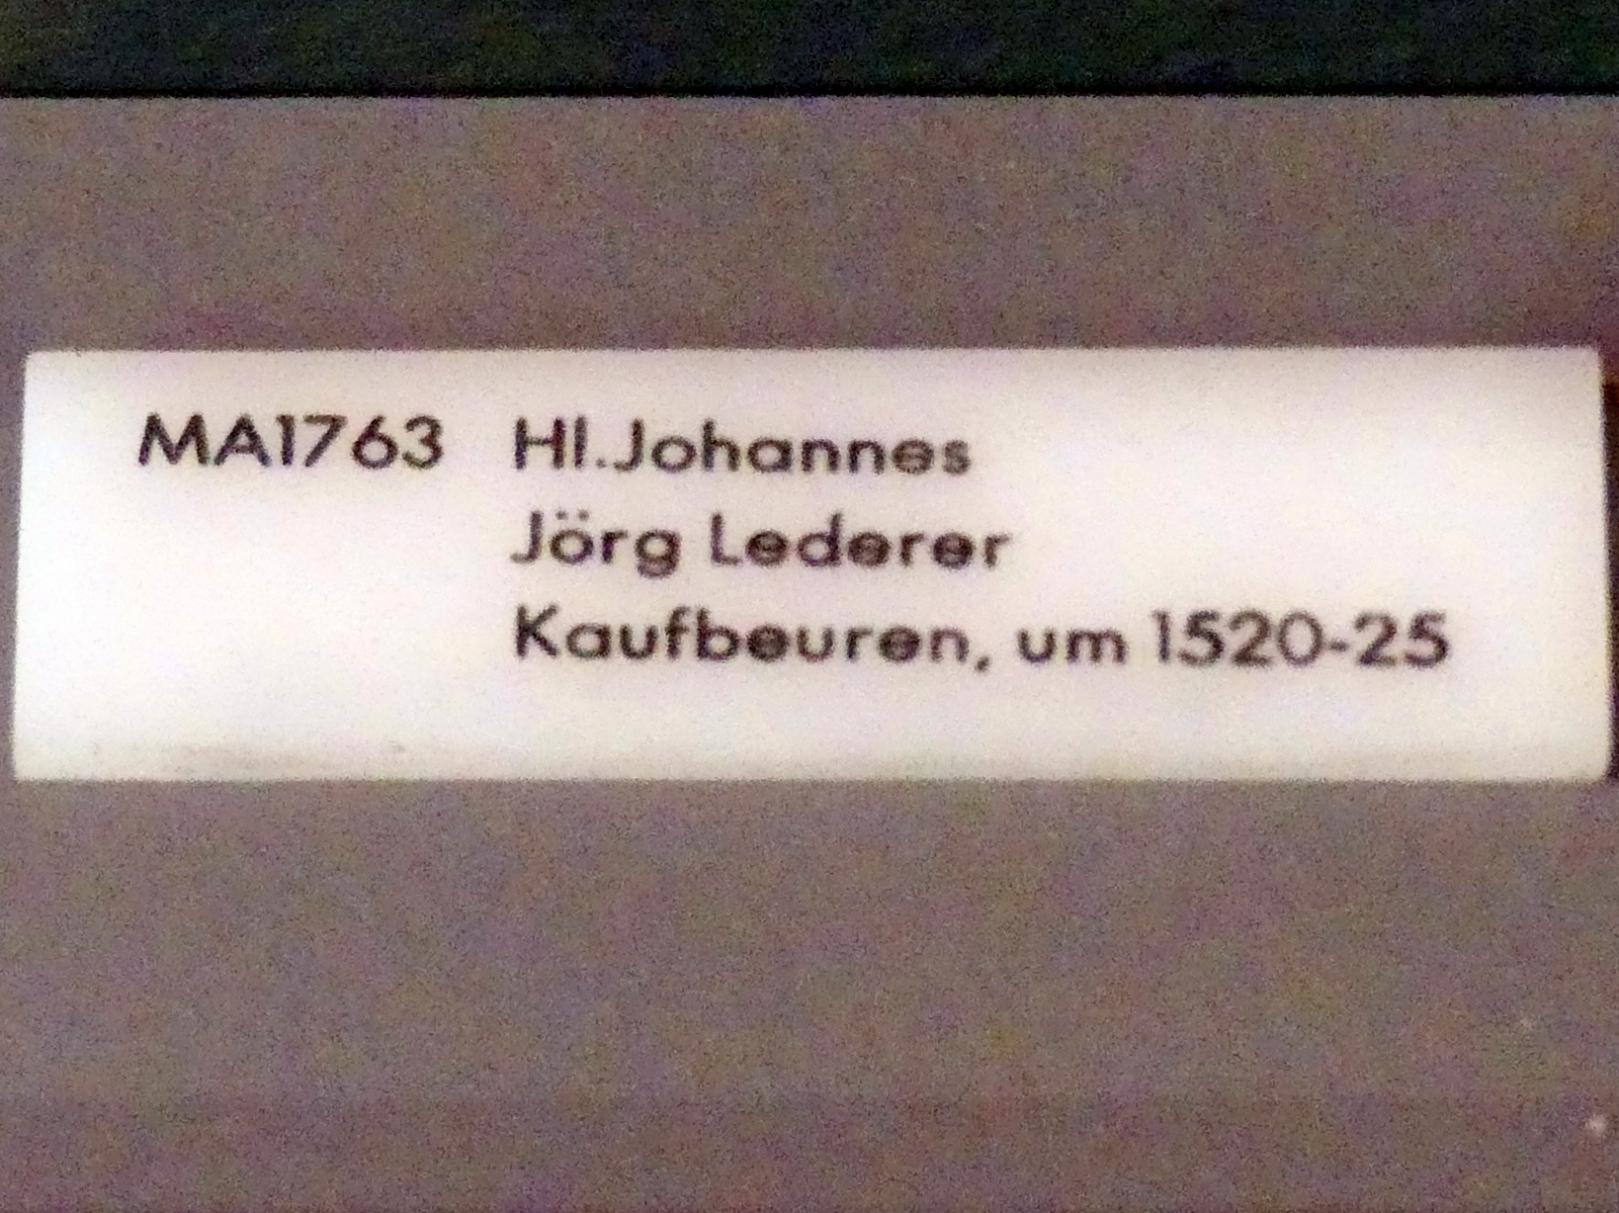 Jörg Lederer: Hl. Johannes, um 1520 - 1525, Bild 3/3